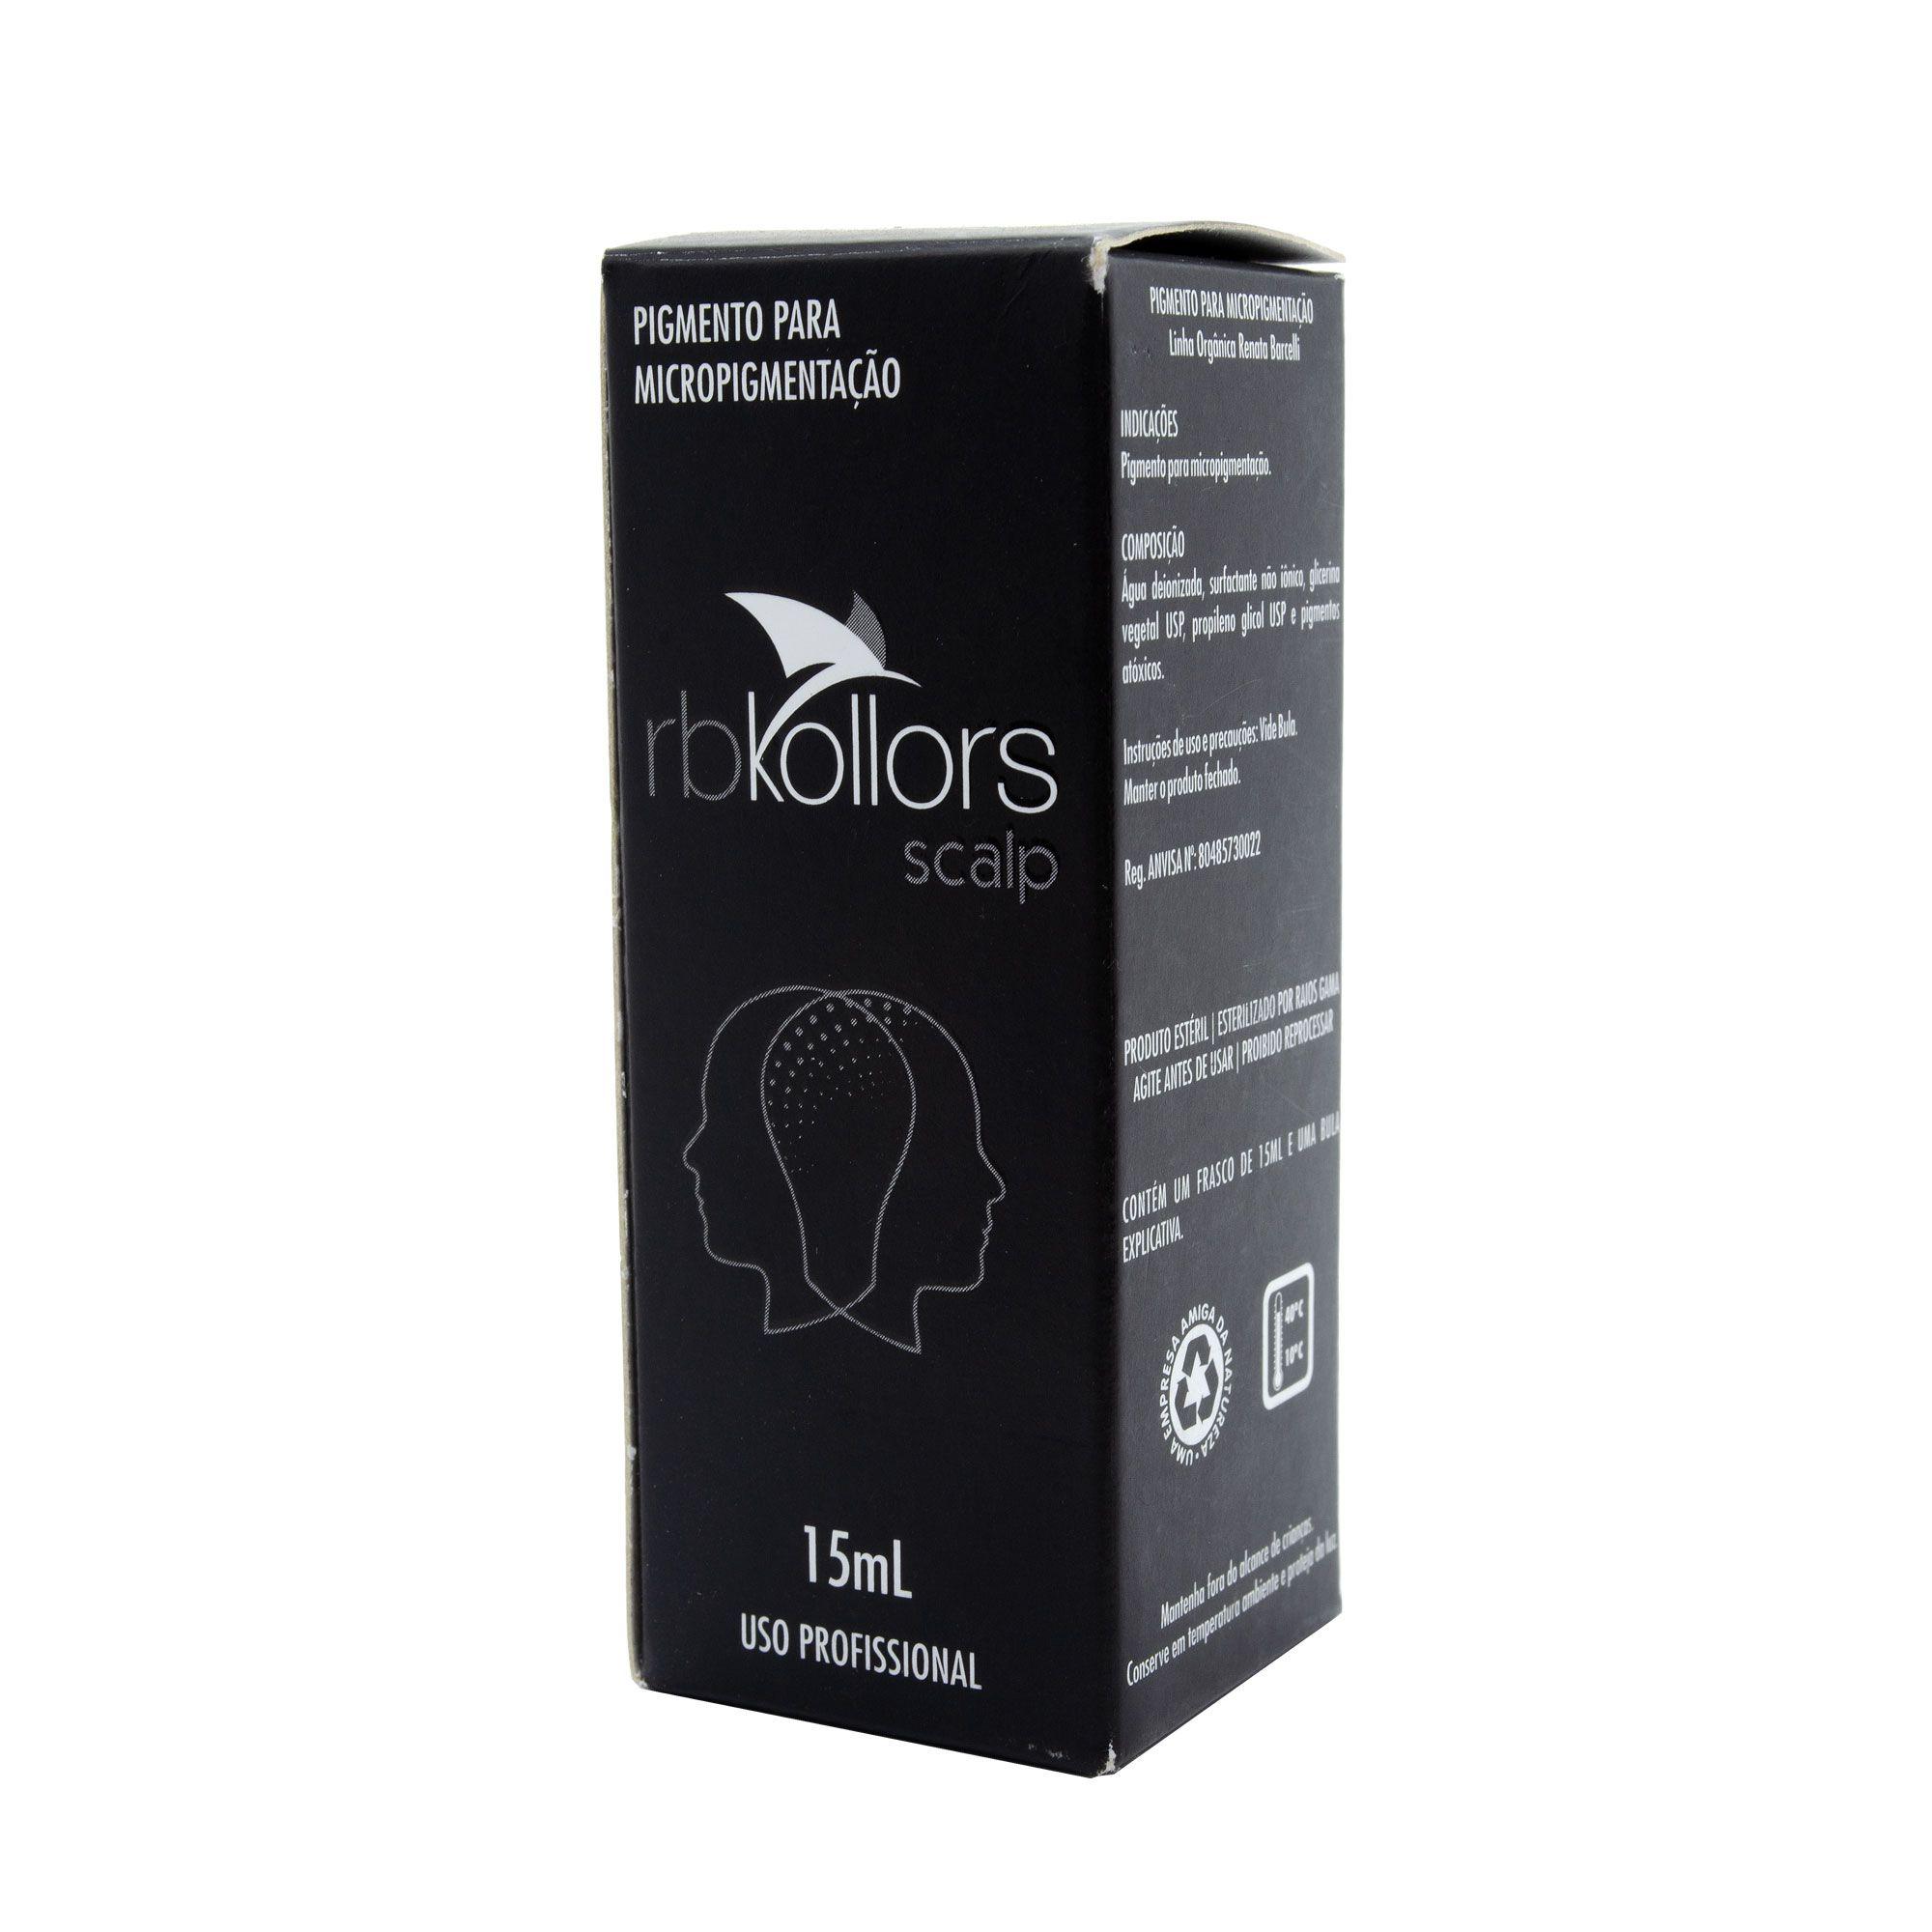 Pigmento Rb Kollors 15ml Scalp Zenon